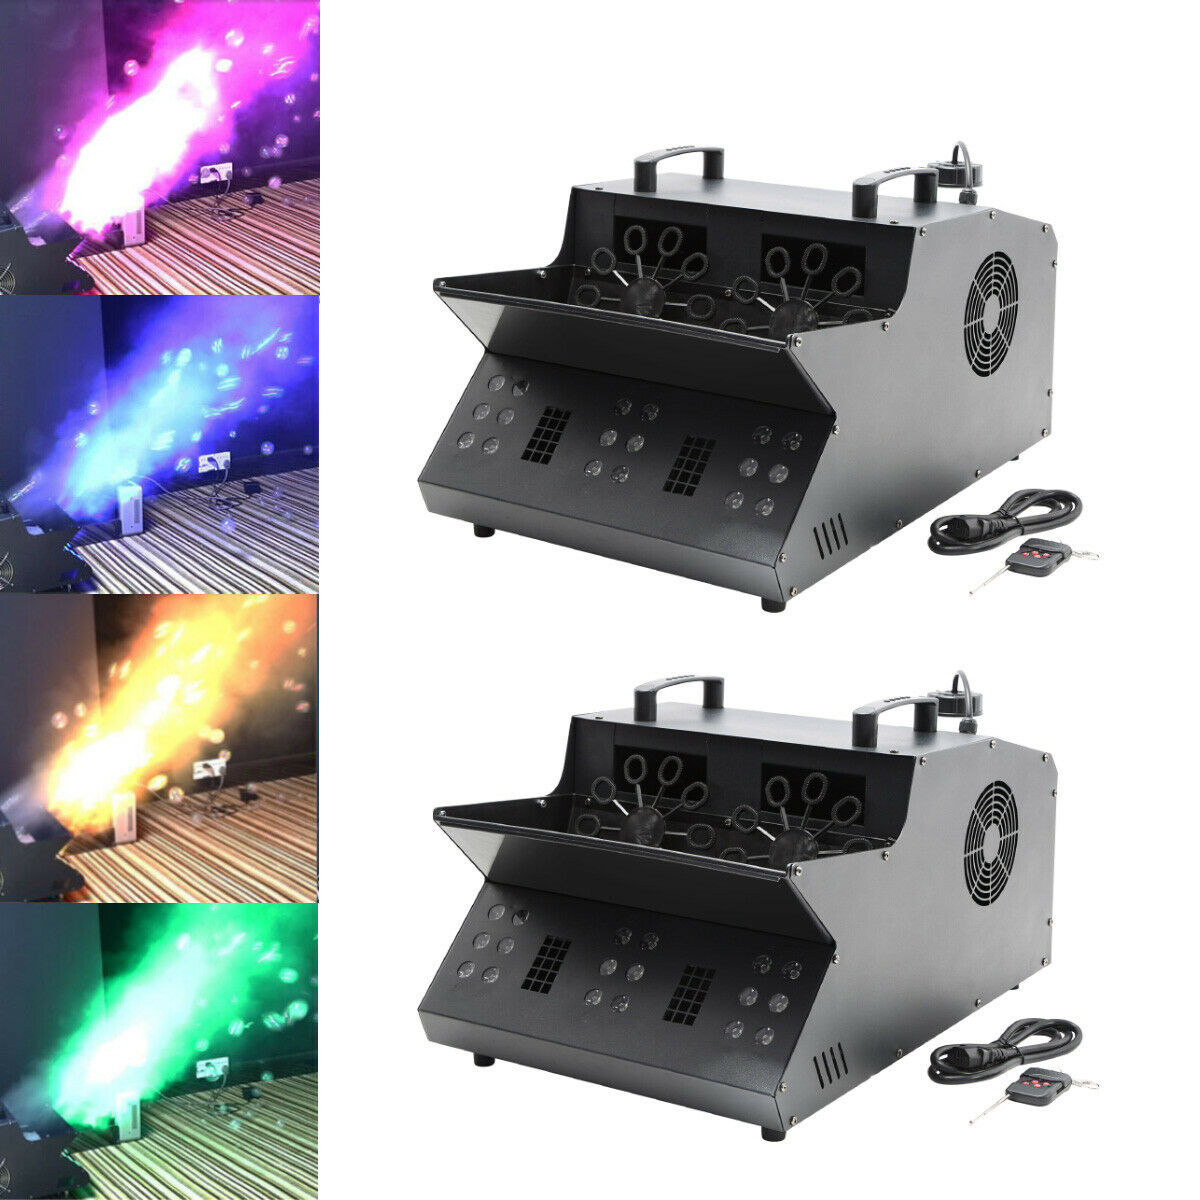 2PCS 3000W Bubble Making Machine Smoke Fog Effect RGB 18LED Stage Light Party DJ